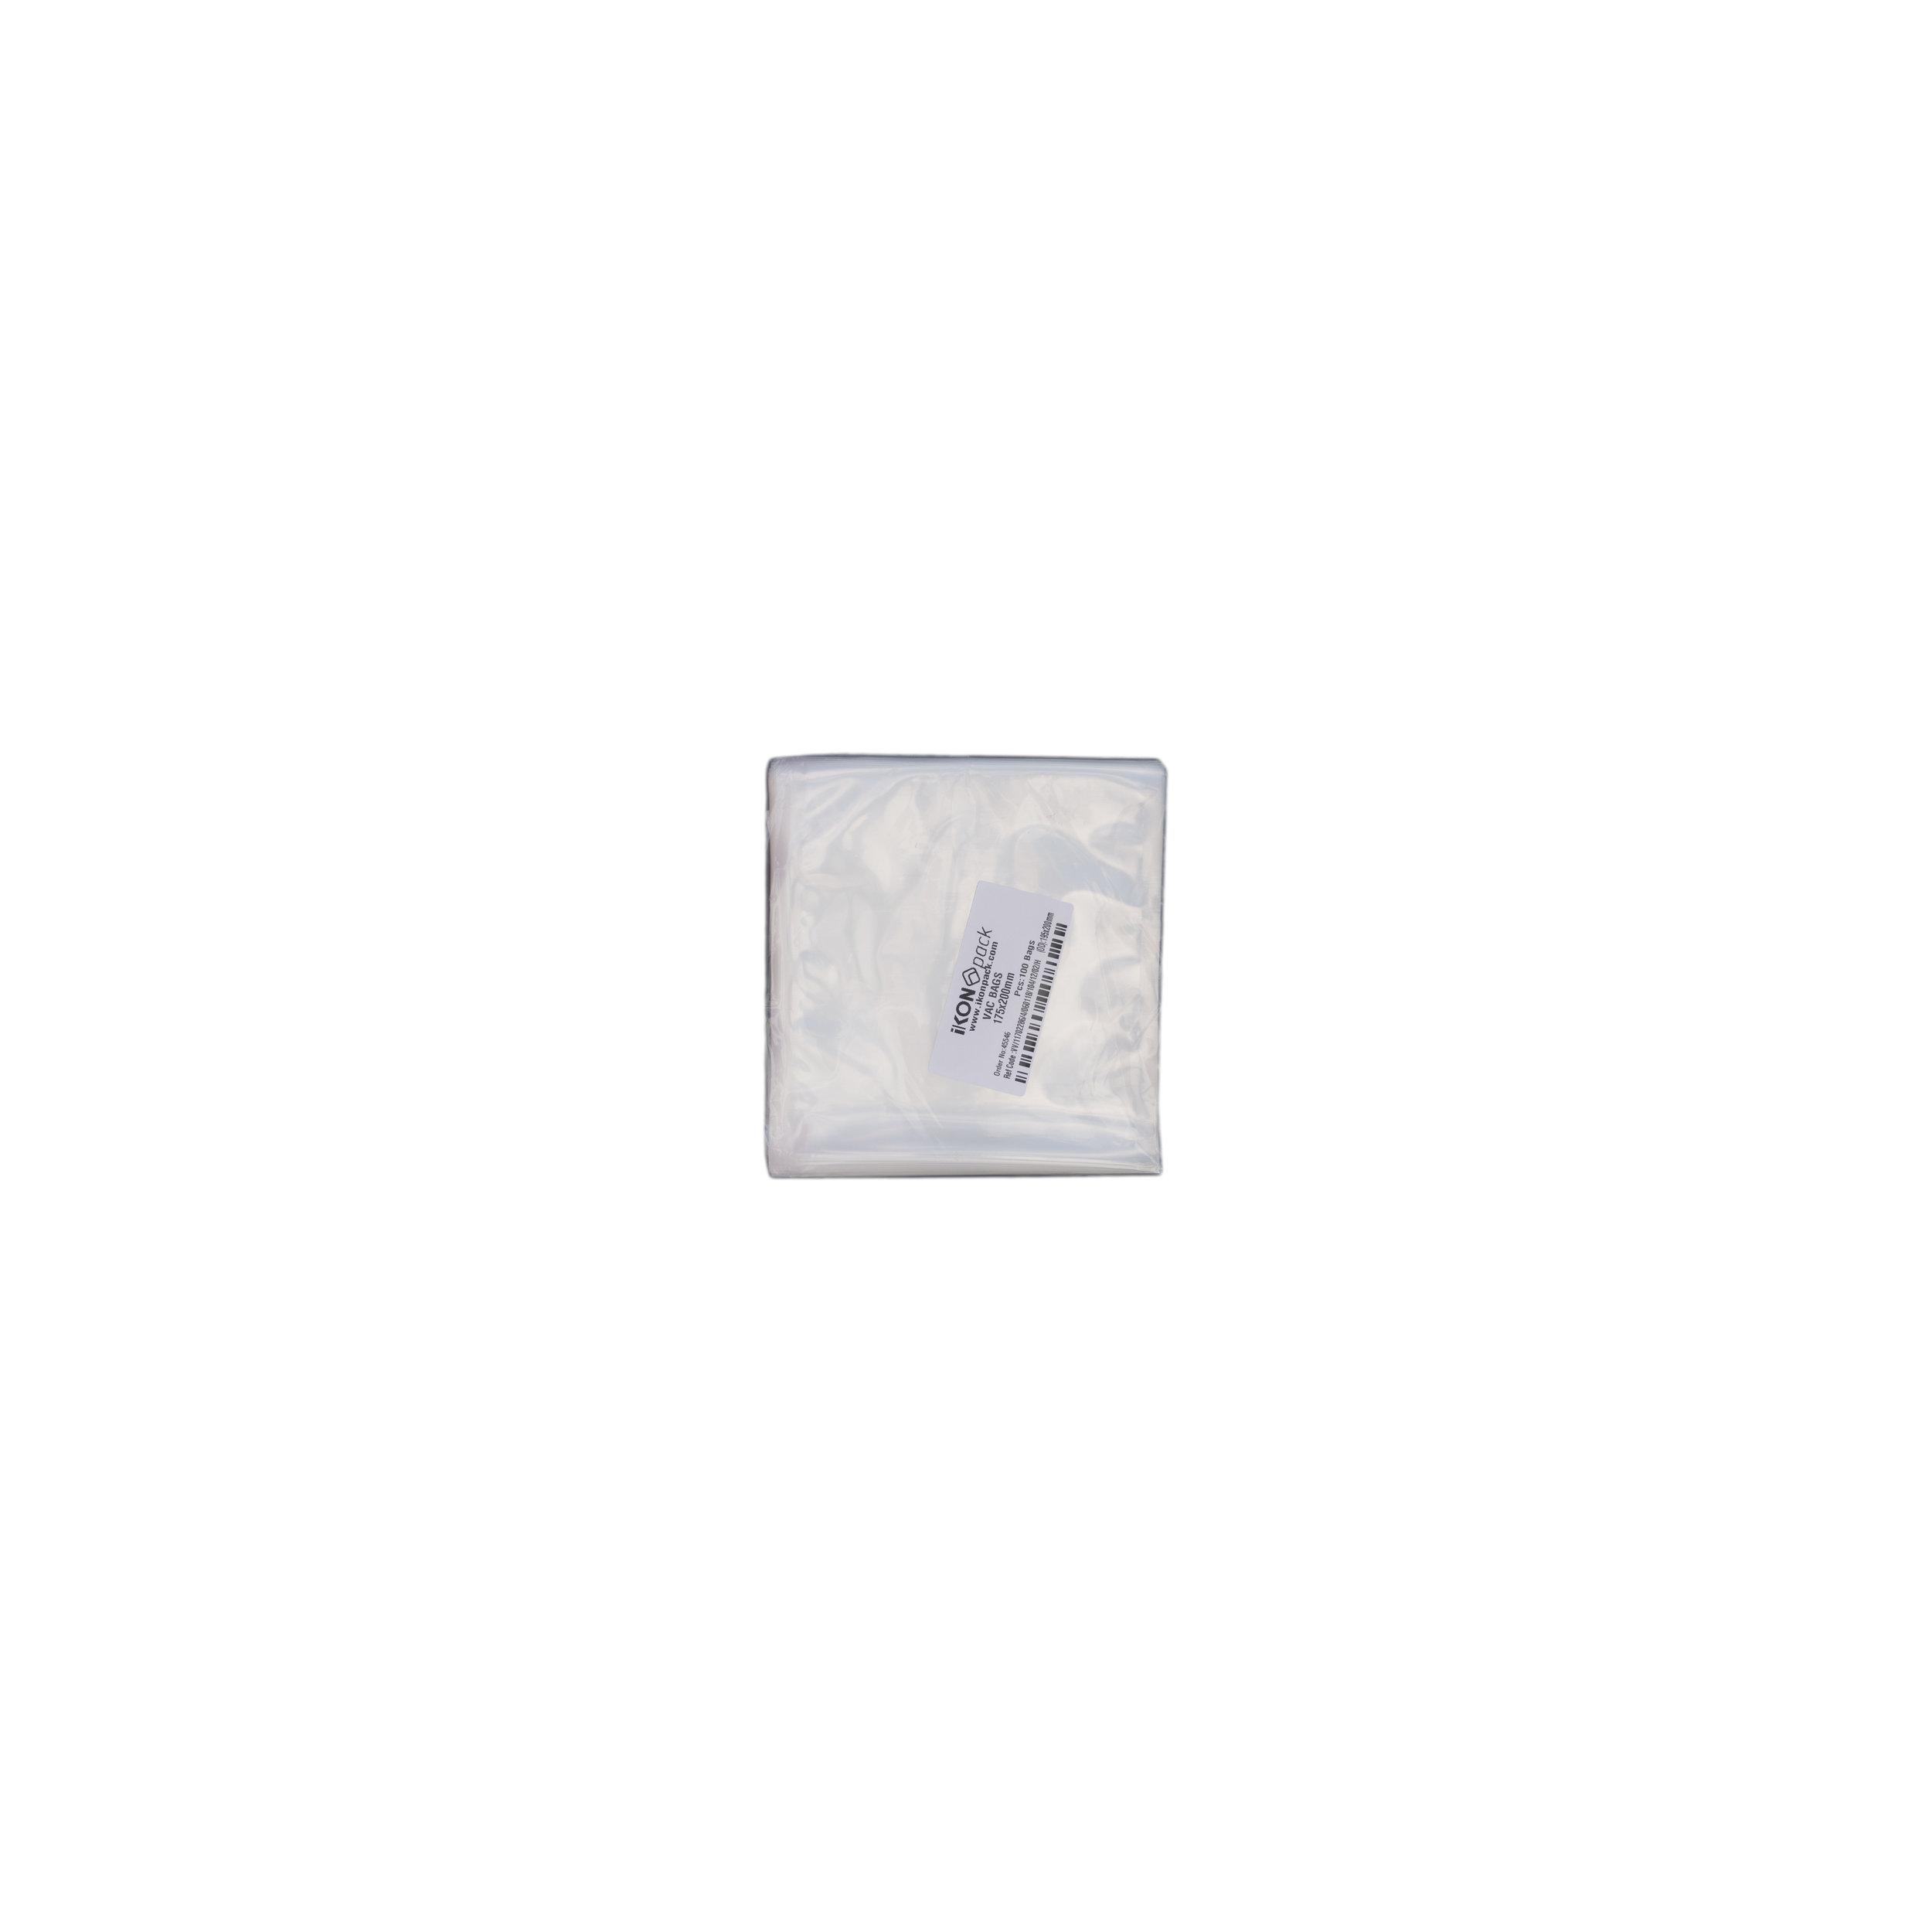 iK-VAC1720      VACUUM POUCH 70 MICRON 175X200    100 per slv 1000 per carton